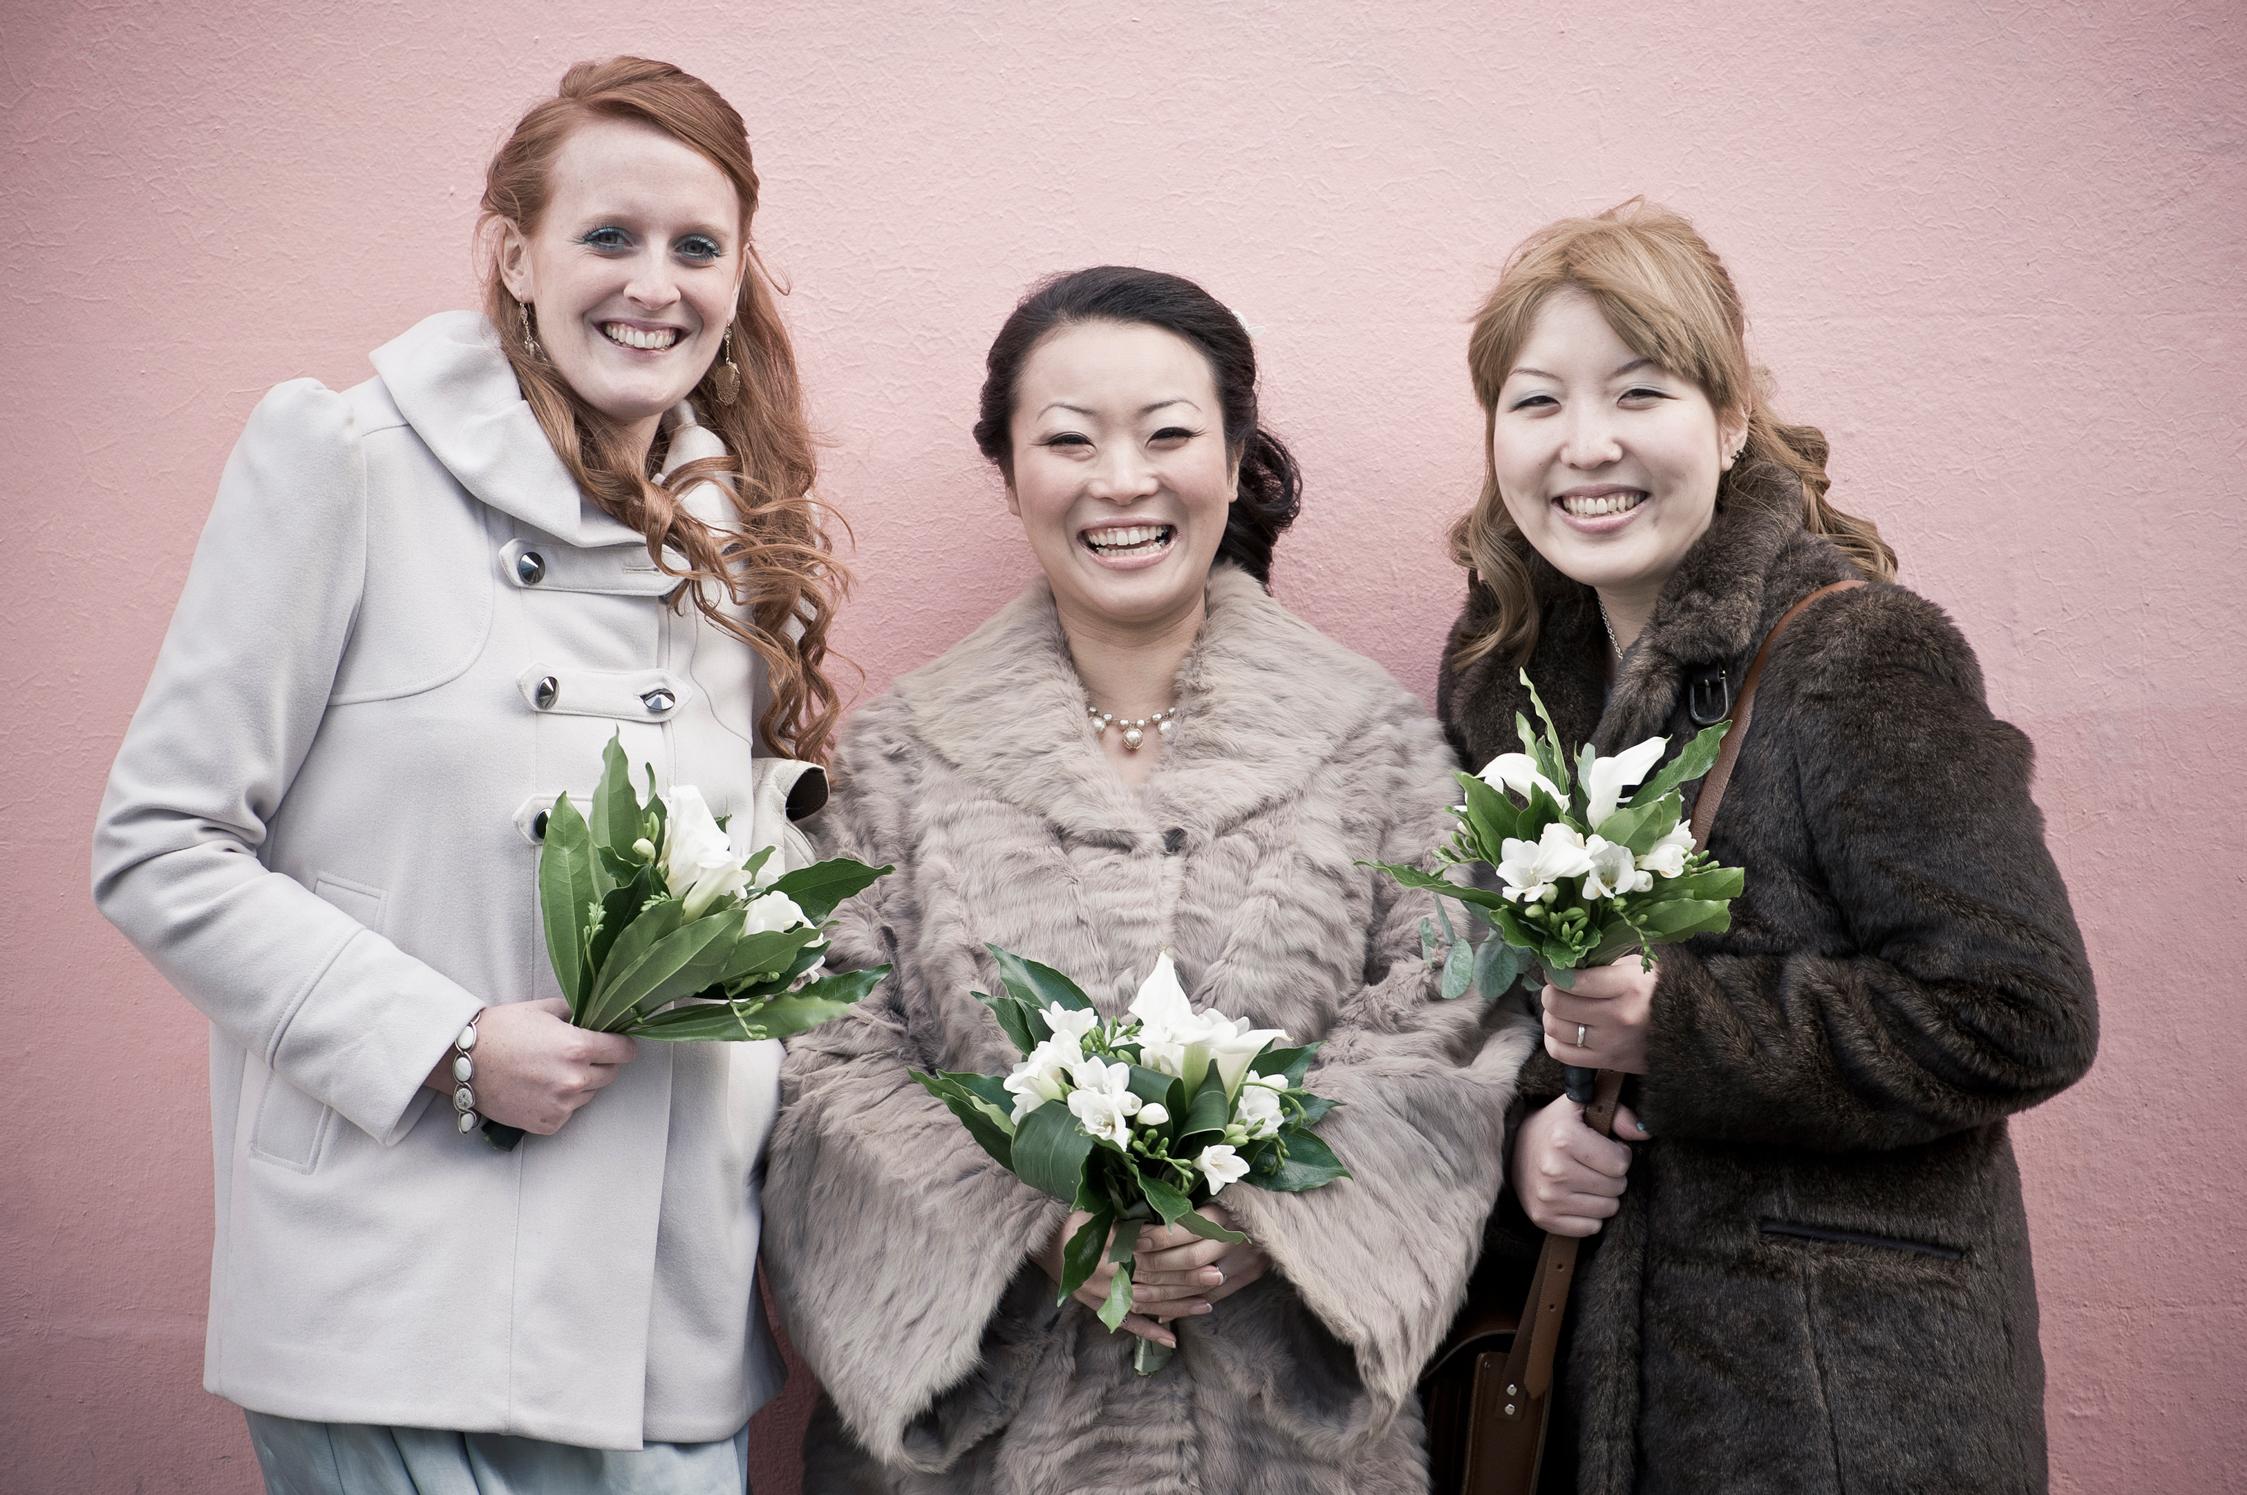 brighton_winter_wedding_03.jpg